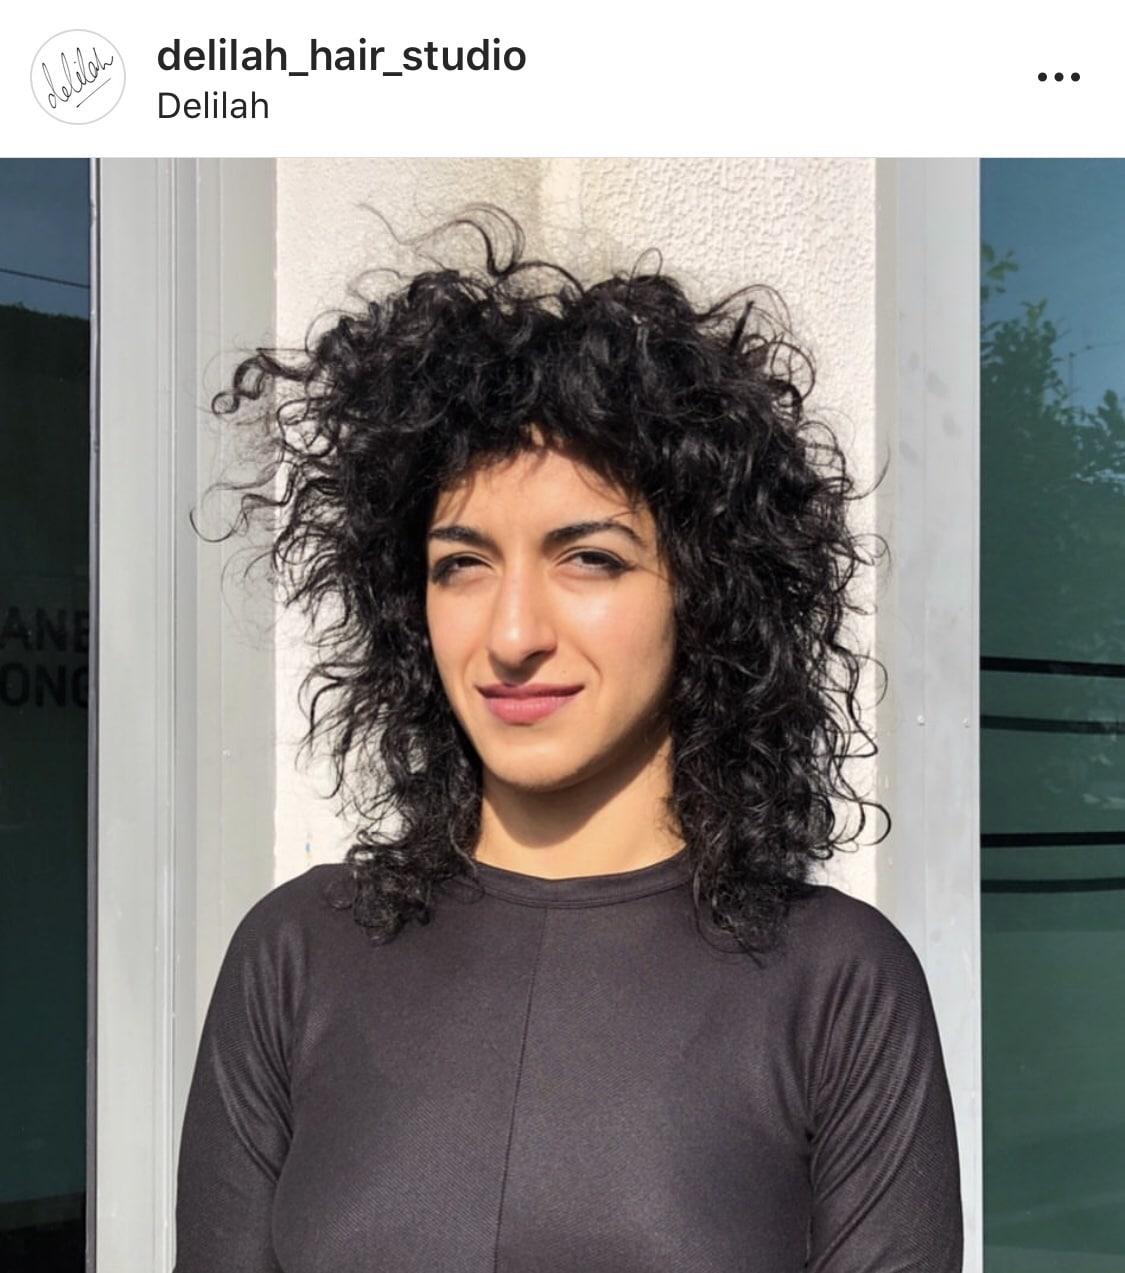 curly hair instagram post